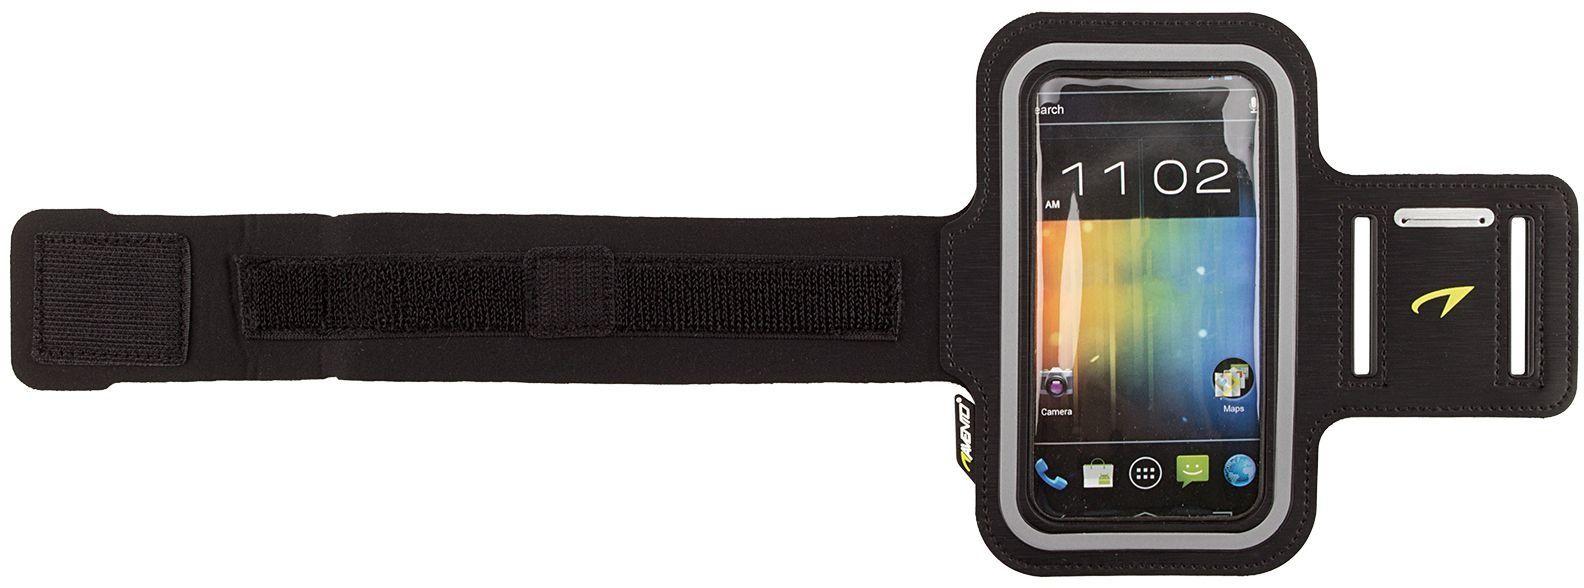 Opaska do biegania na ramię smartfon Avento